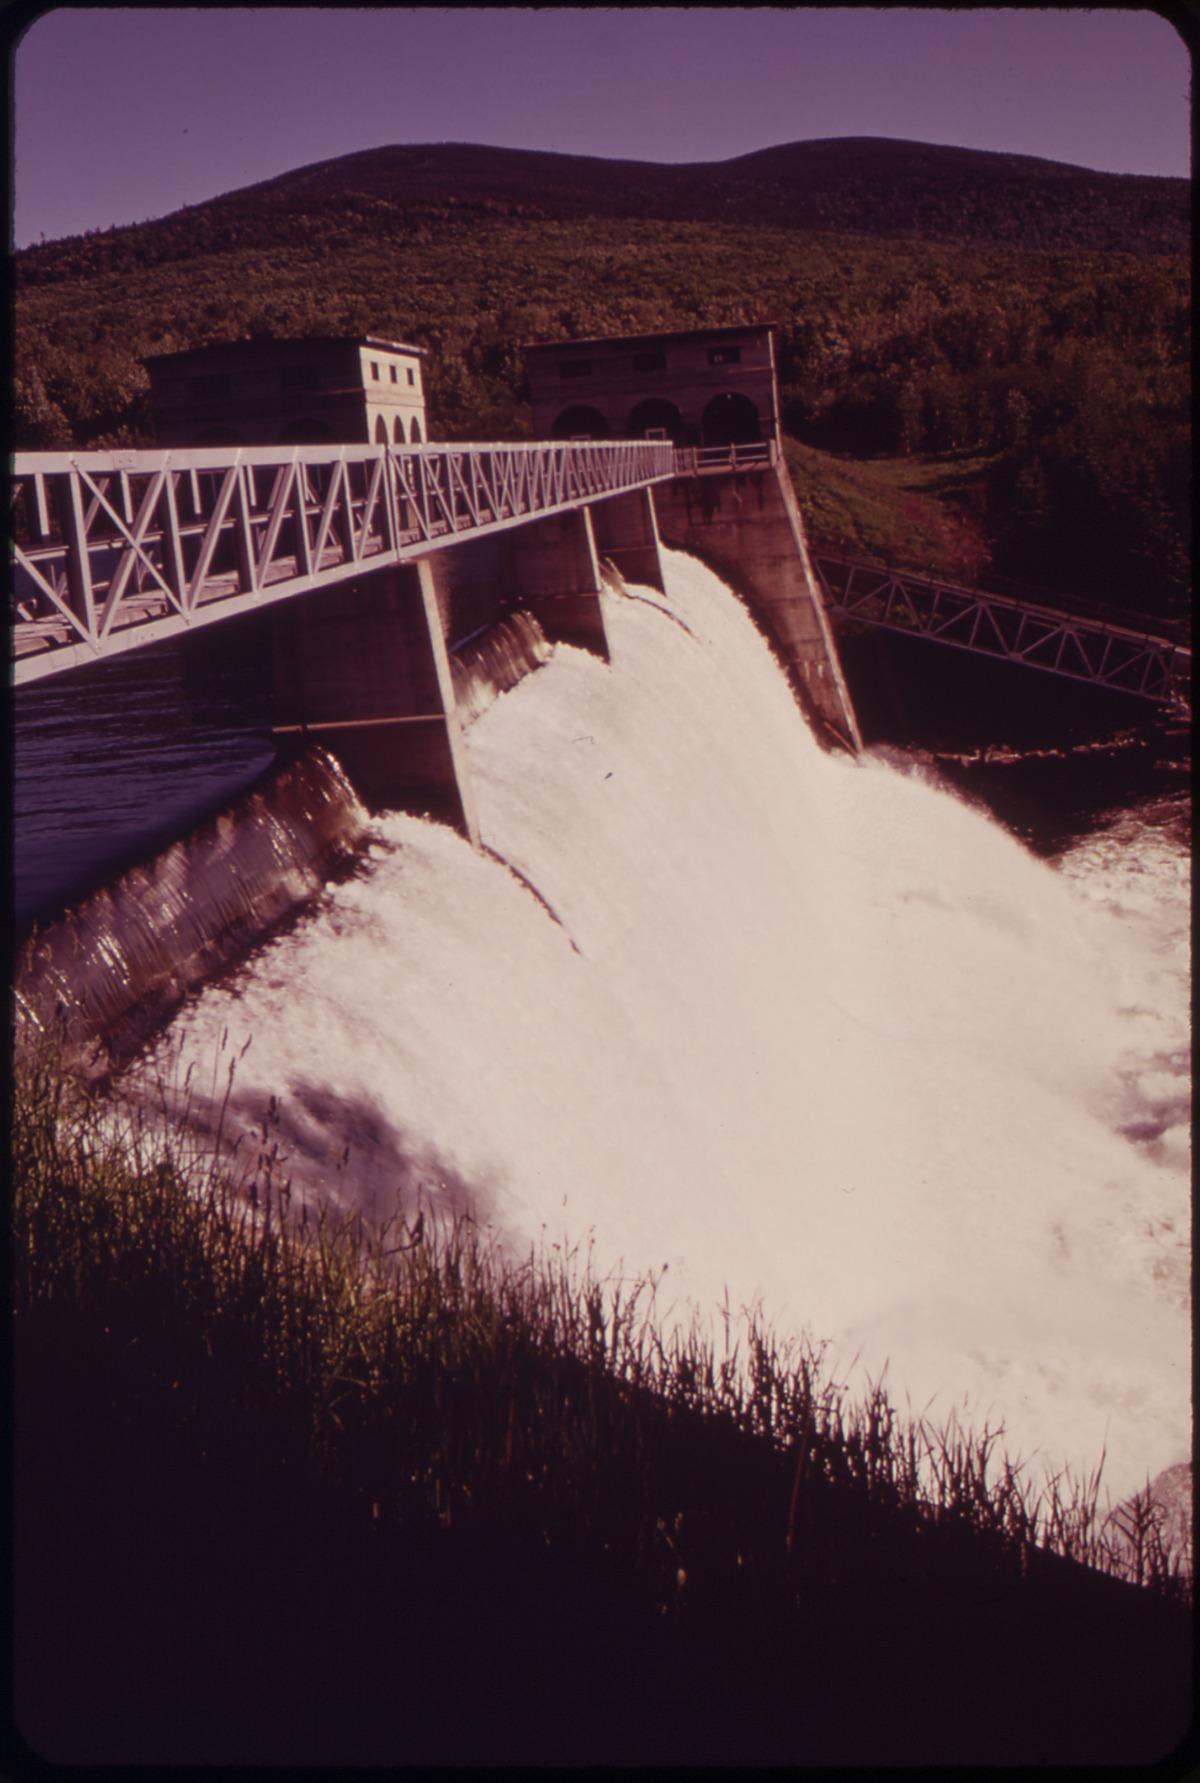 lac aziscohos  u2014 wikip u00e9dia